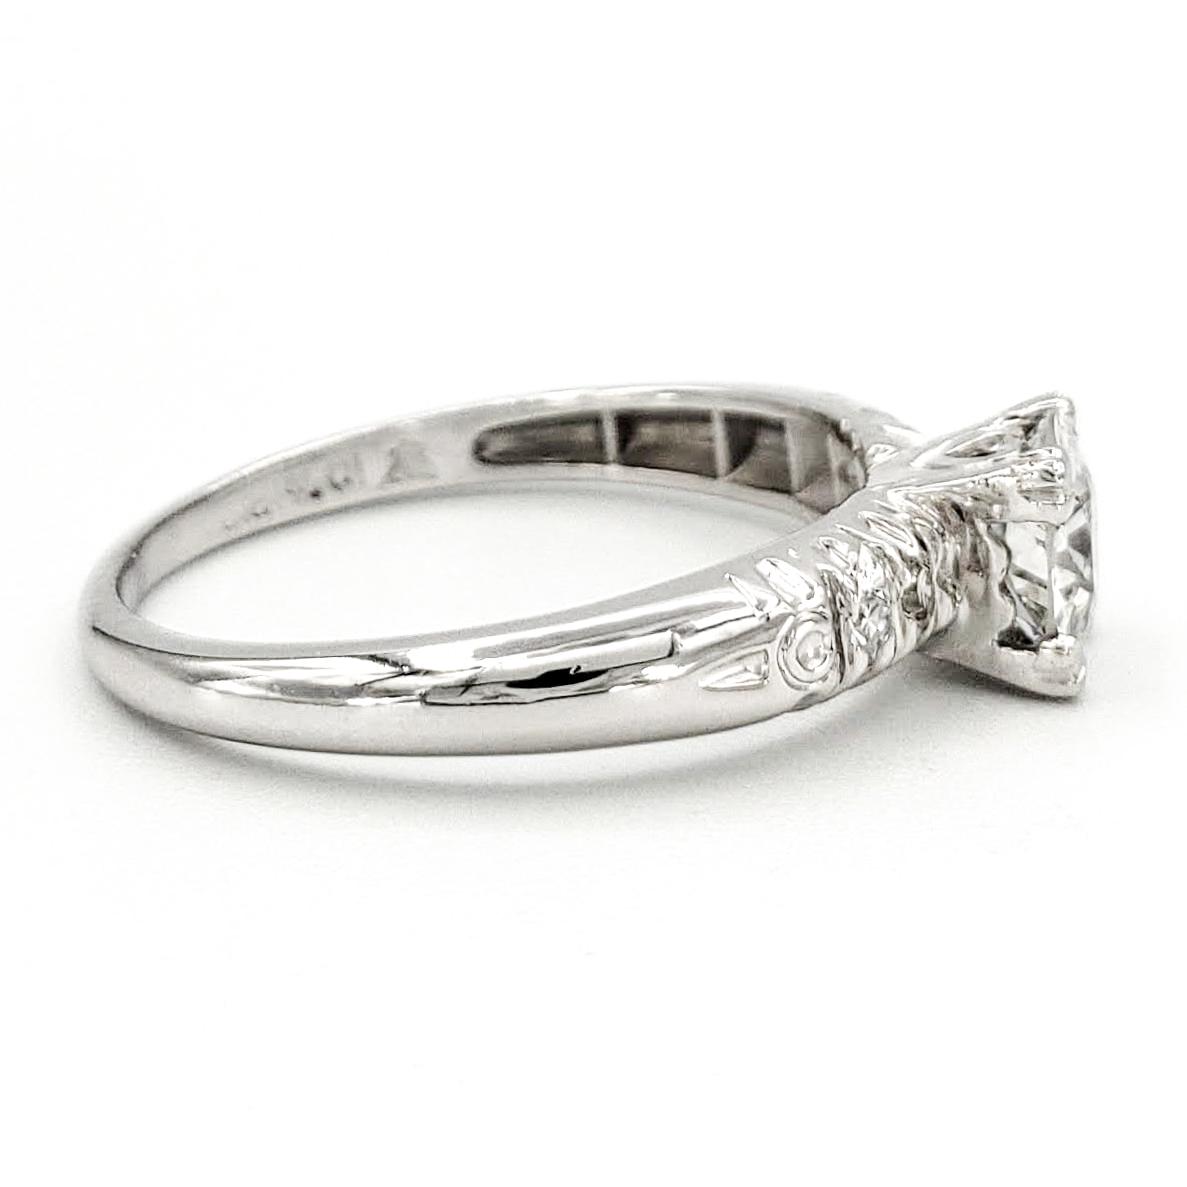 vintage-platinum-engagement-ring-with-0-44-carat-old-european-cut-diamond-egl-e-vs2